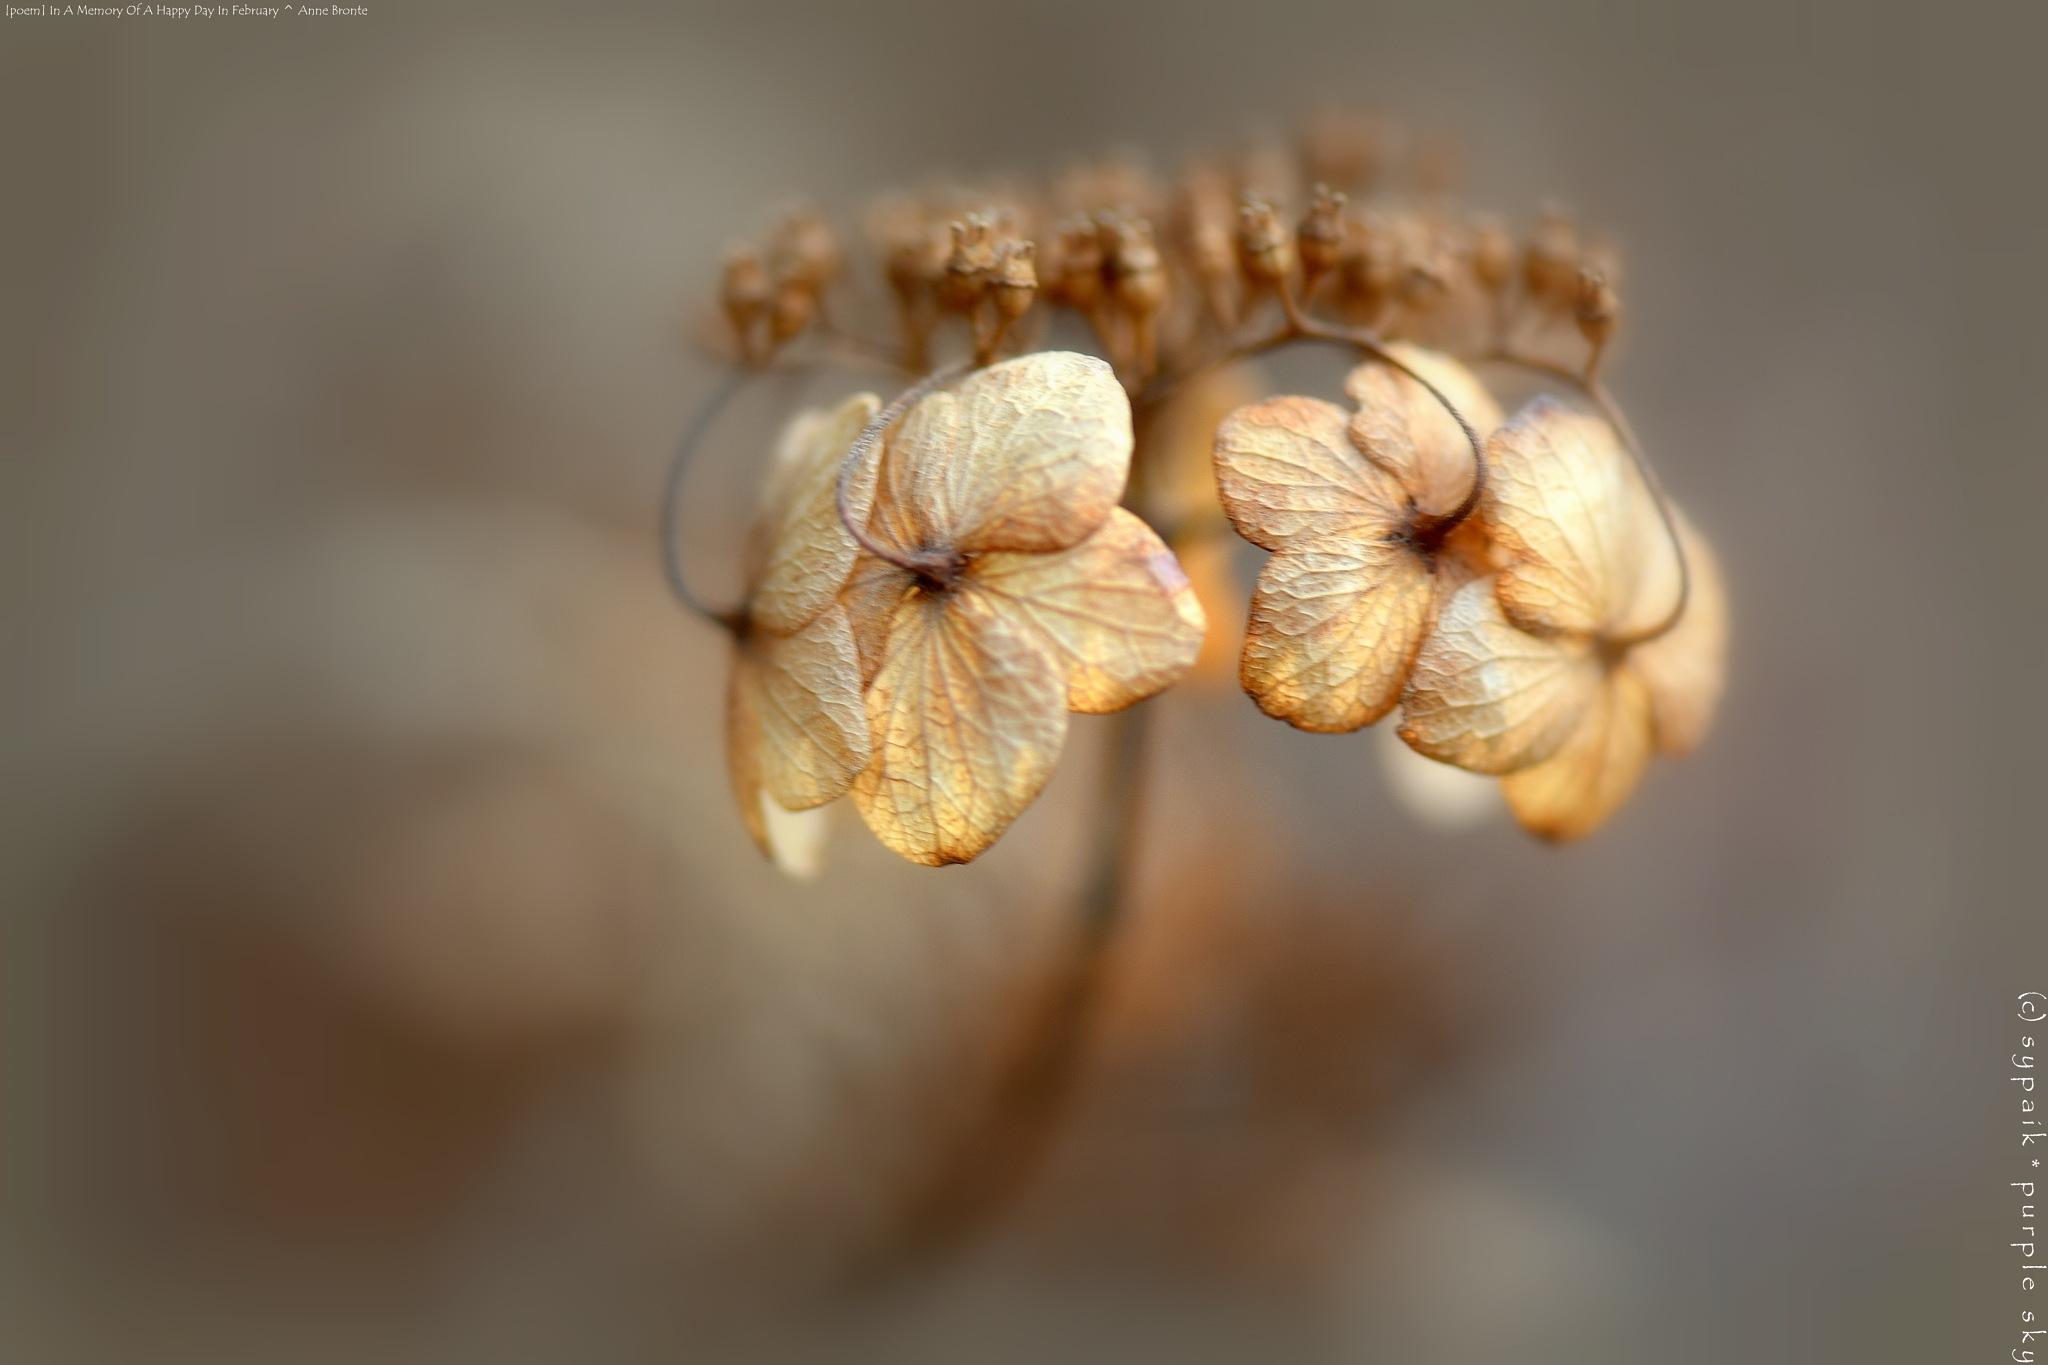 Photo in Random #poem by anne brontë #hydrangea #dried plant #nature #macro #closeup #nikon #february